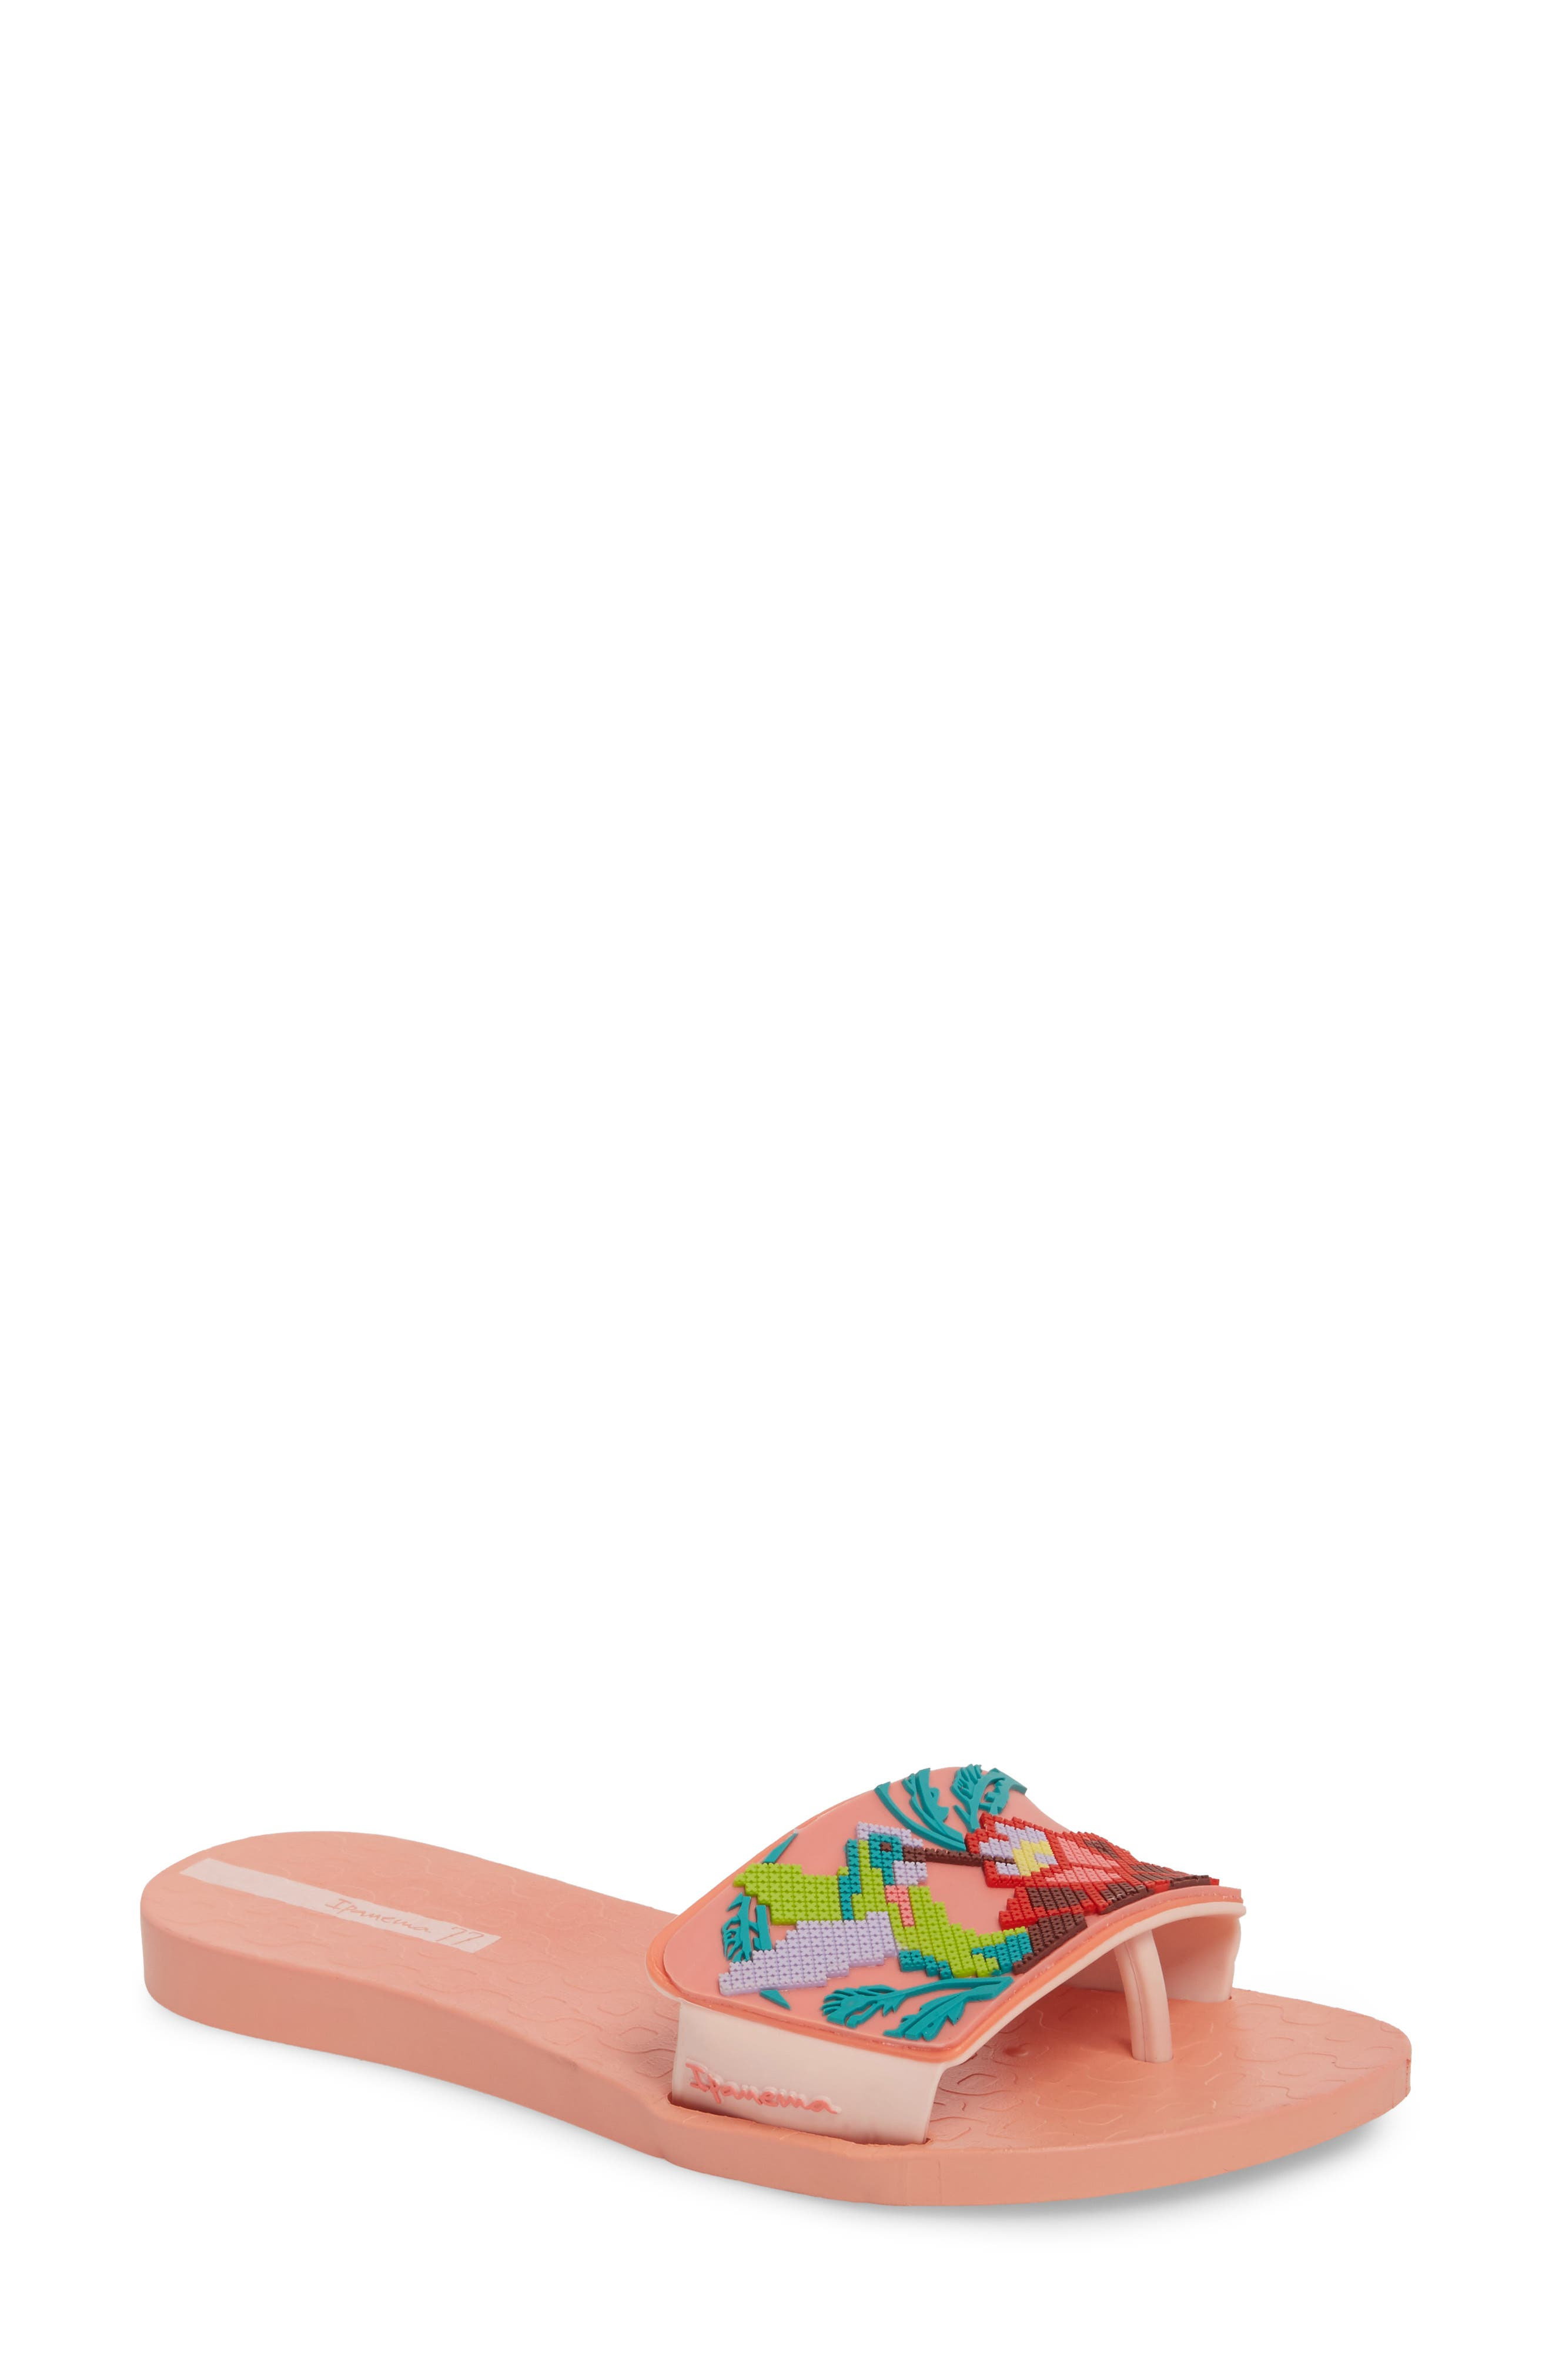 IPANEMA Nectar Floral Slide Sandal in Orange/ Pink